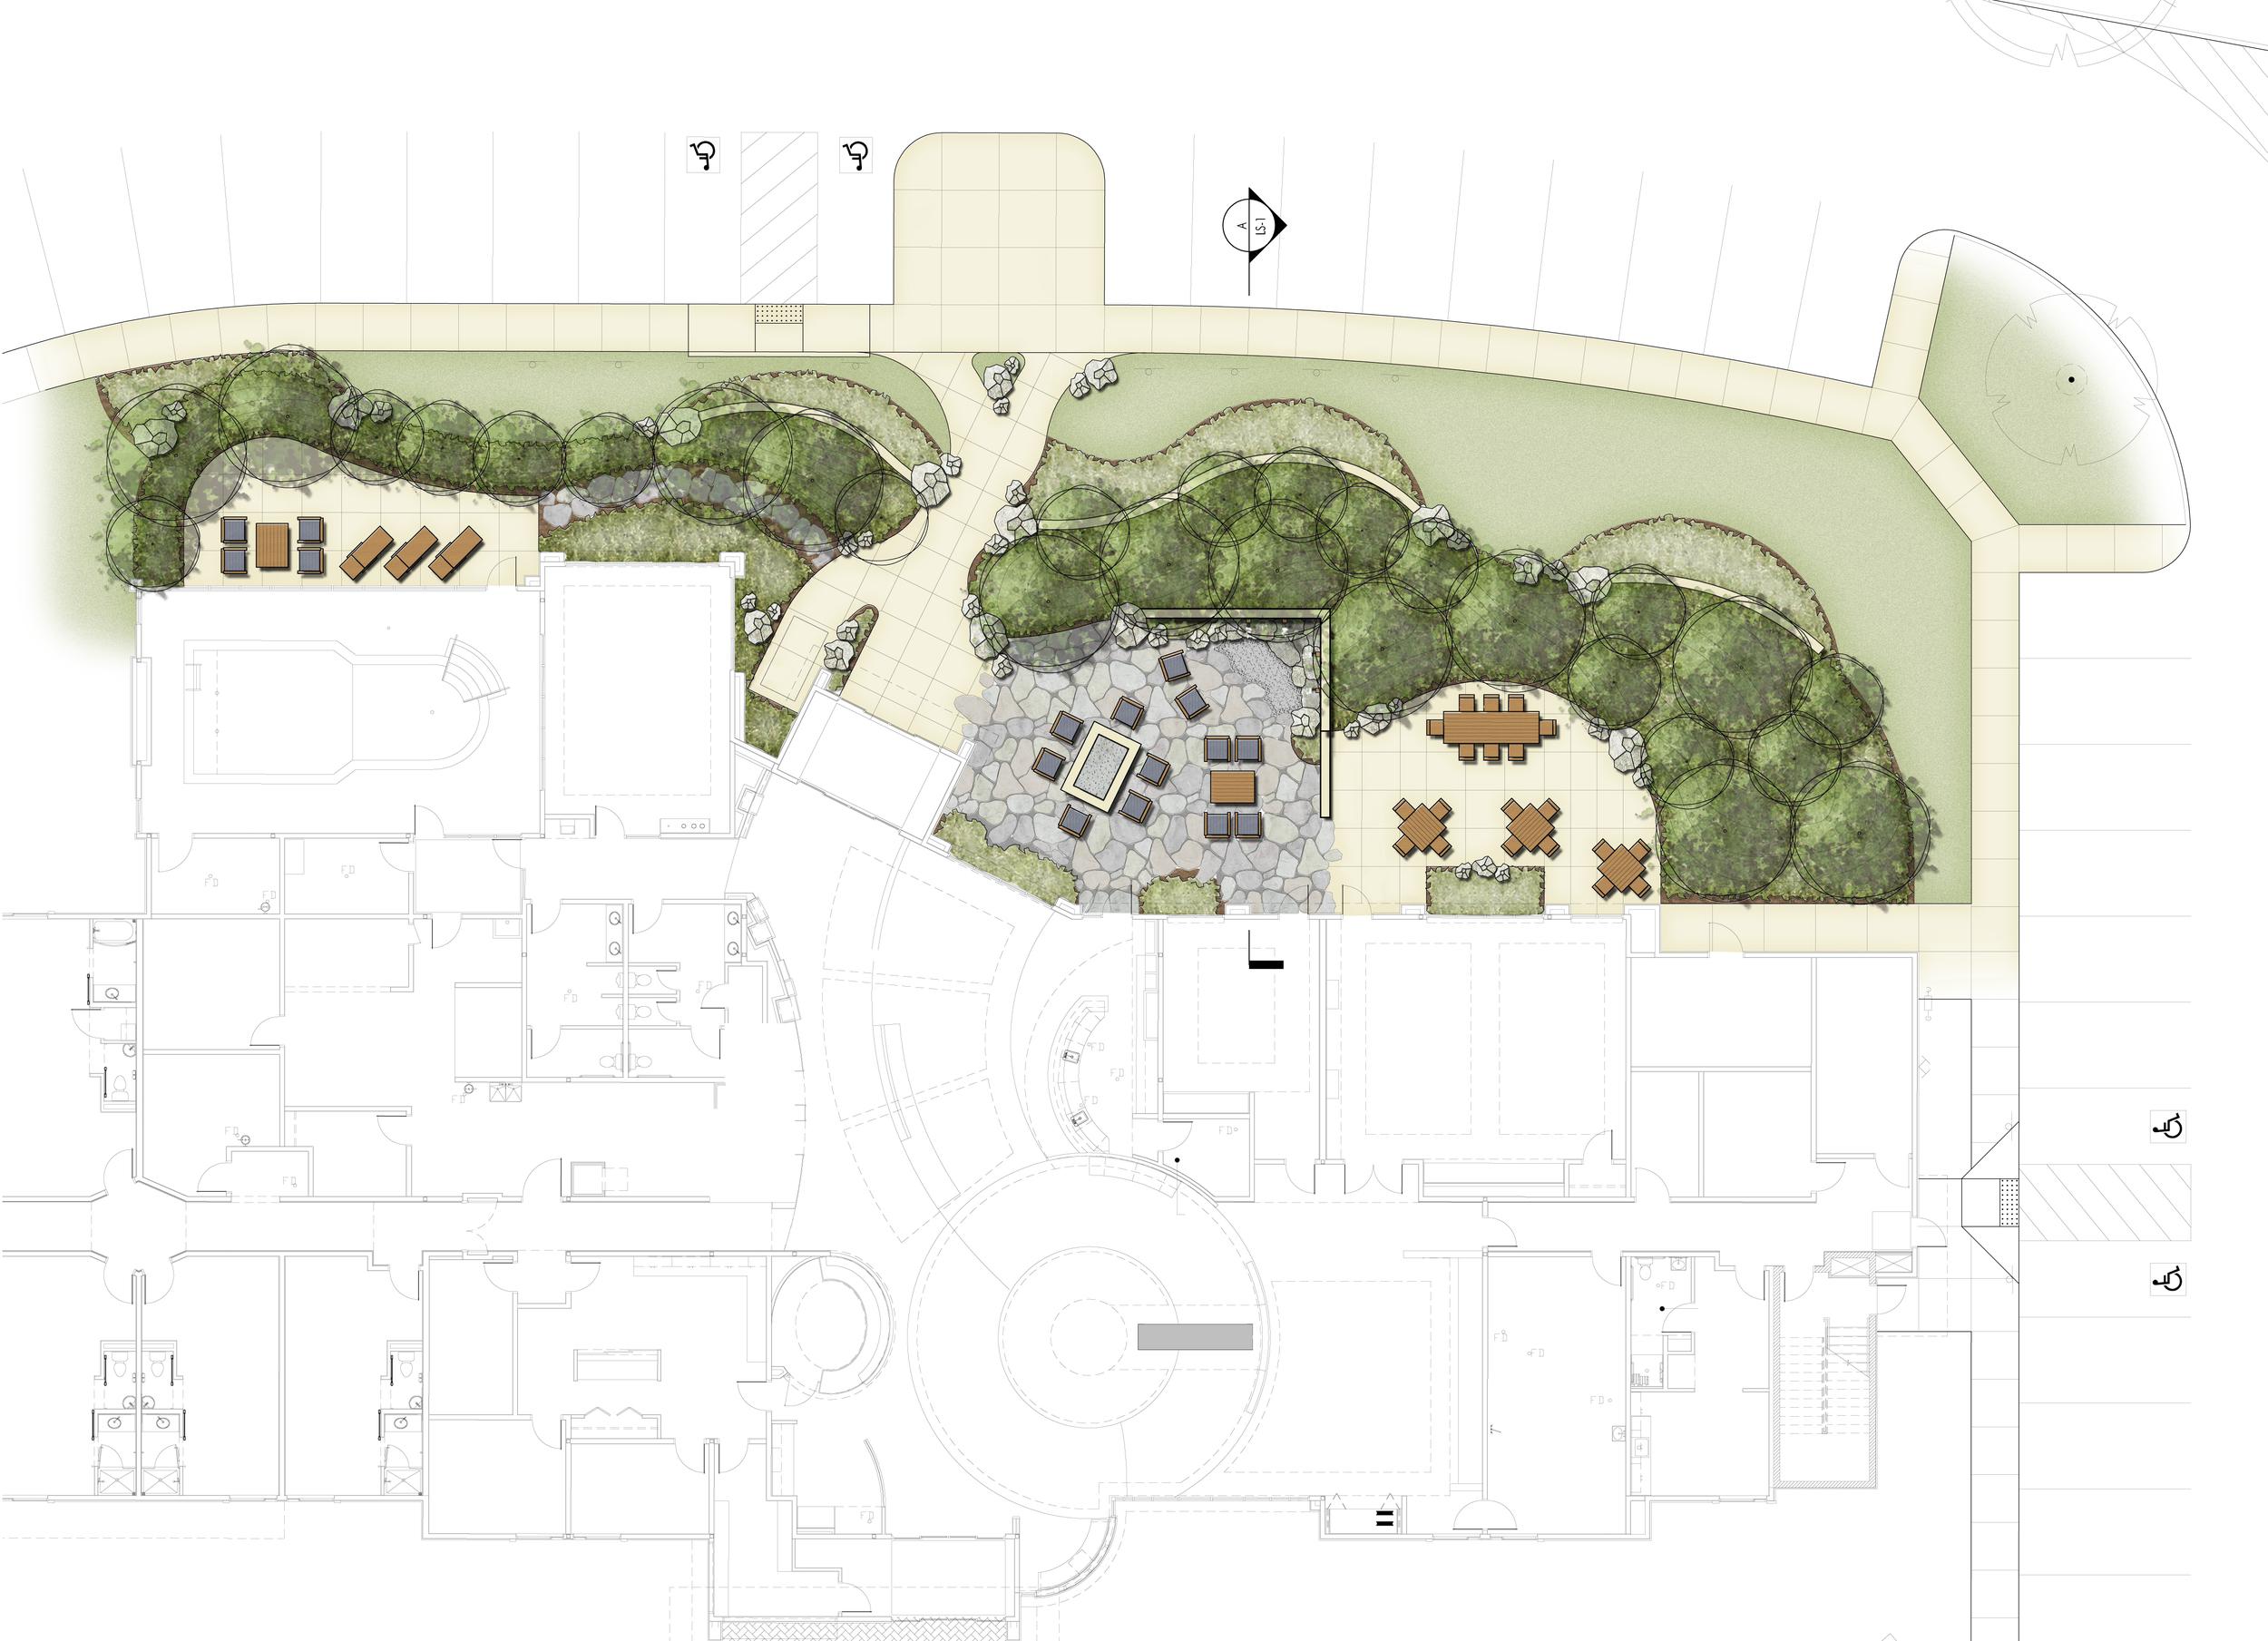 Concept Landscape Plan 11-19-10.jpg